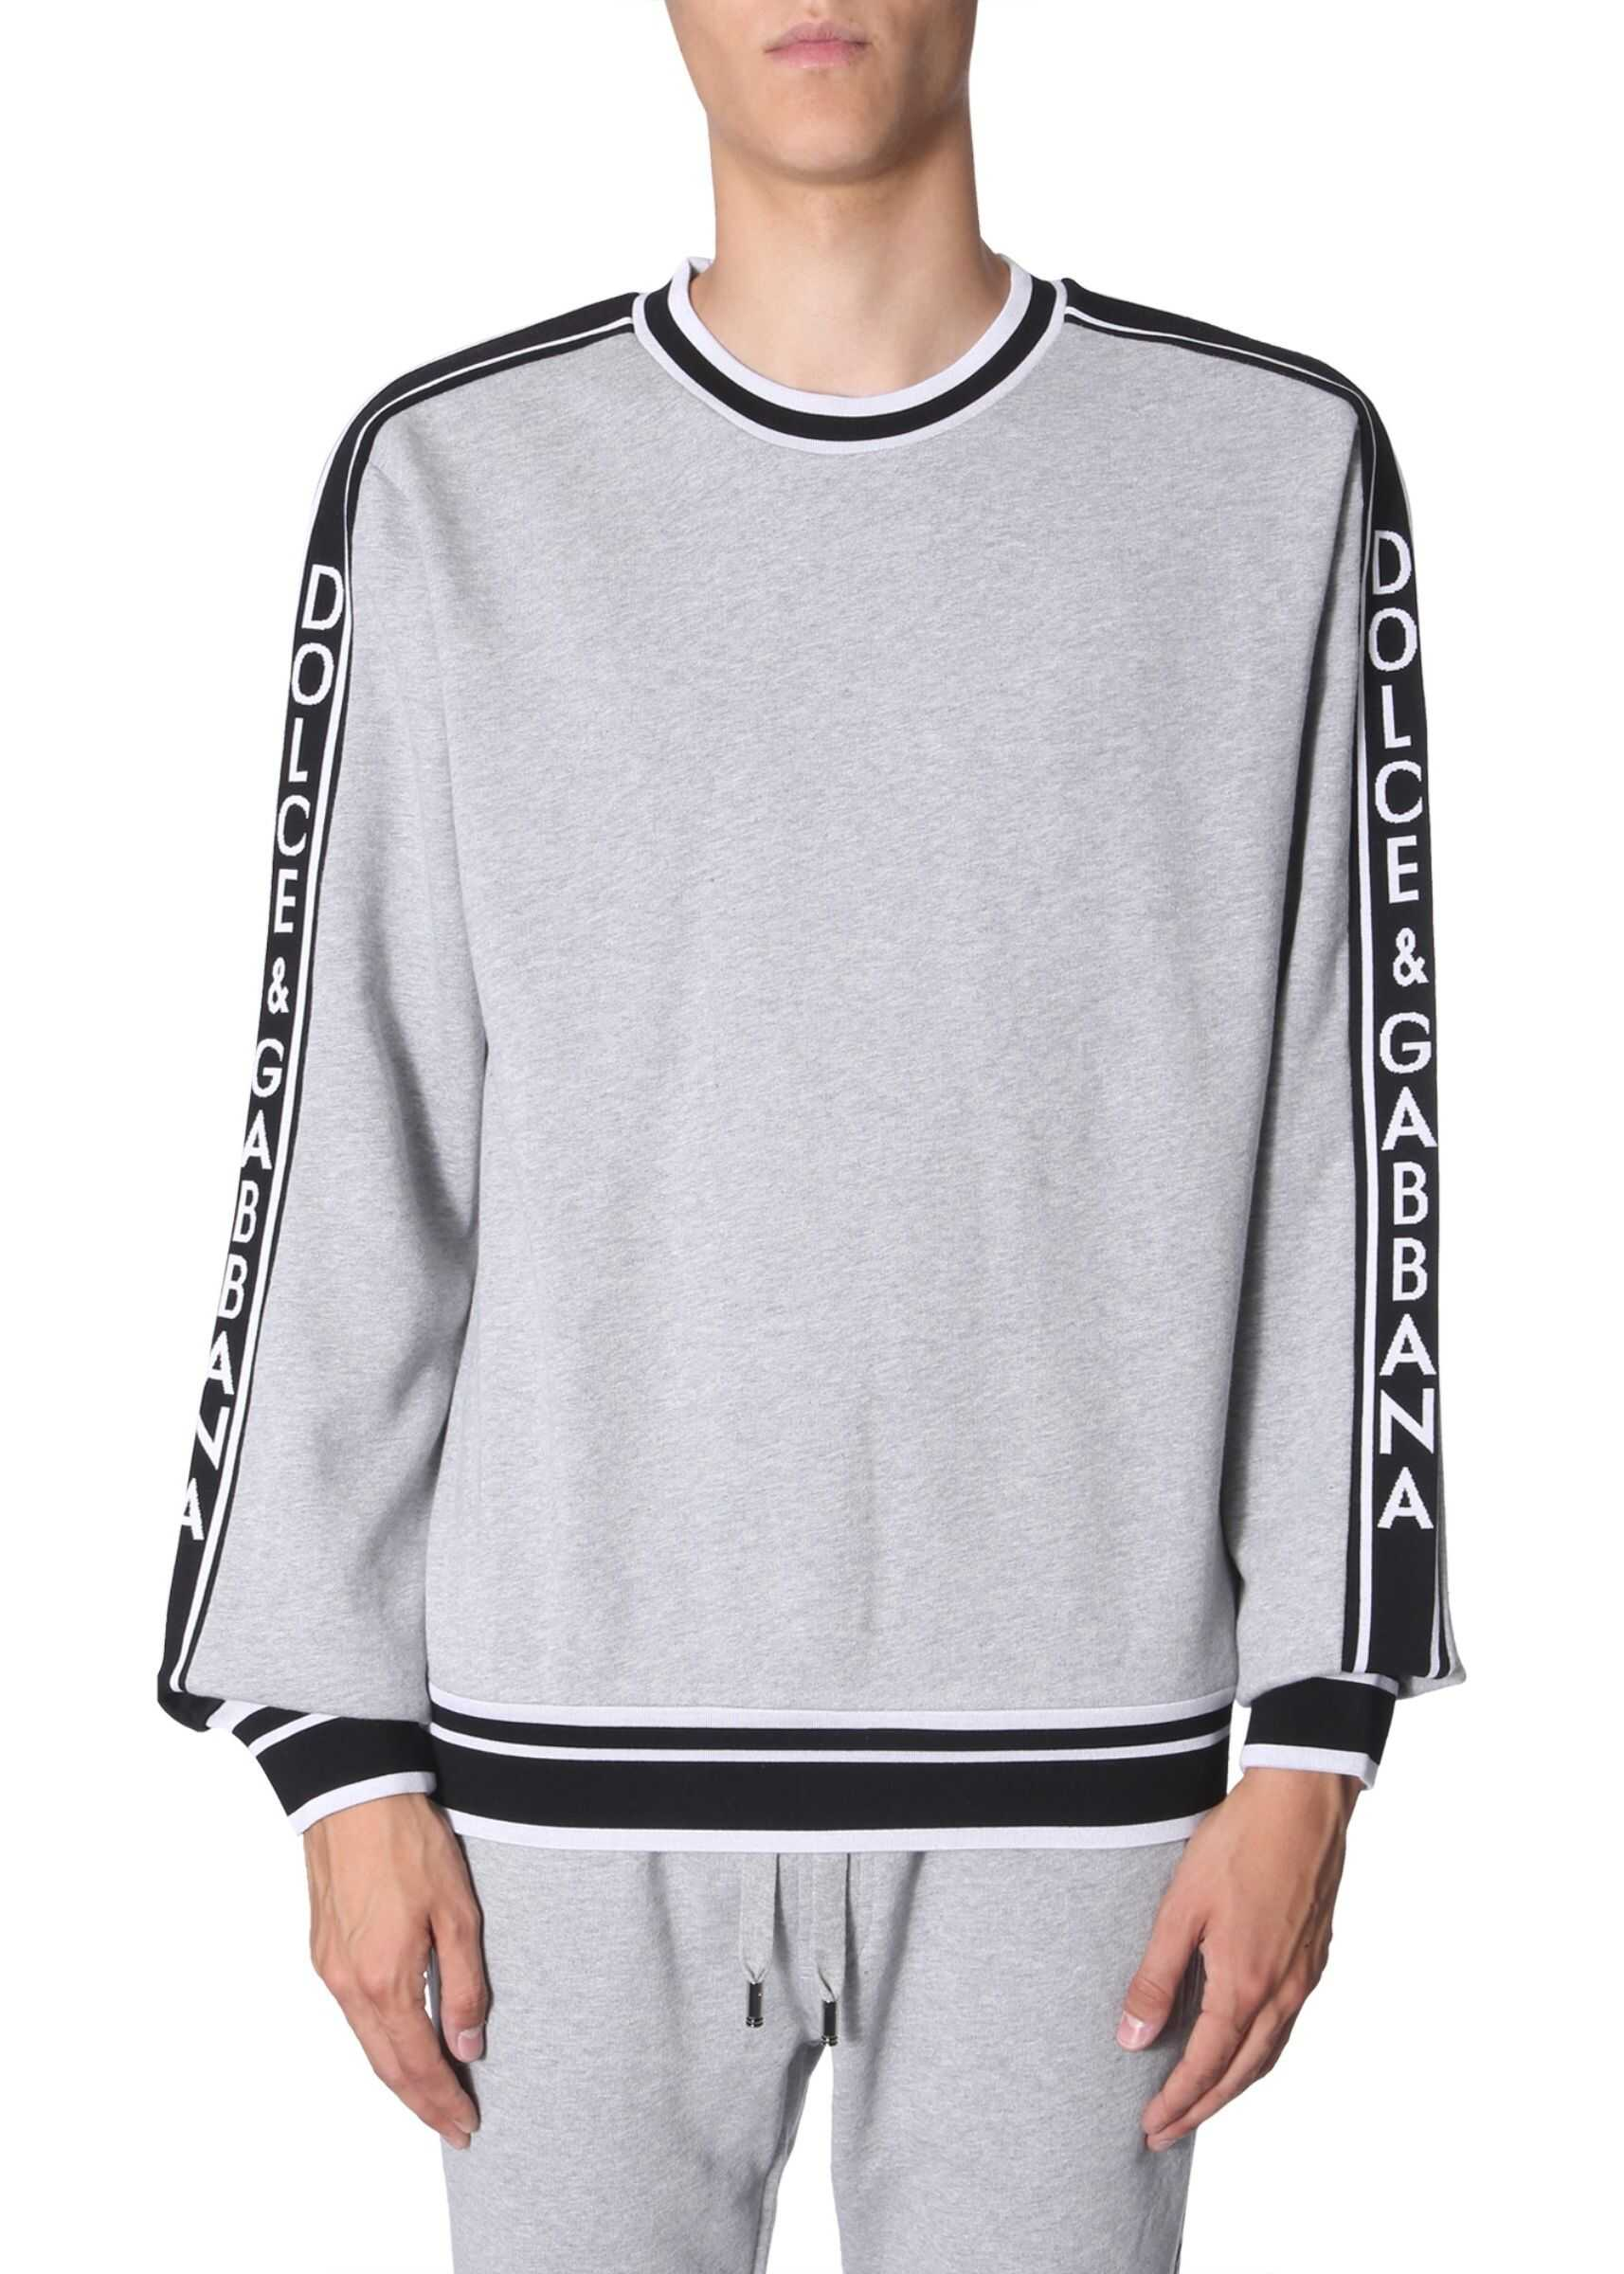 Dolce & Gabbana Crew Neck Sweatshirt GREY